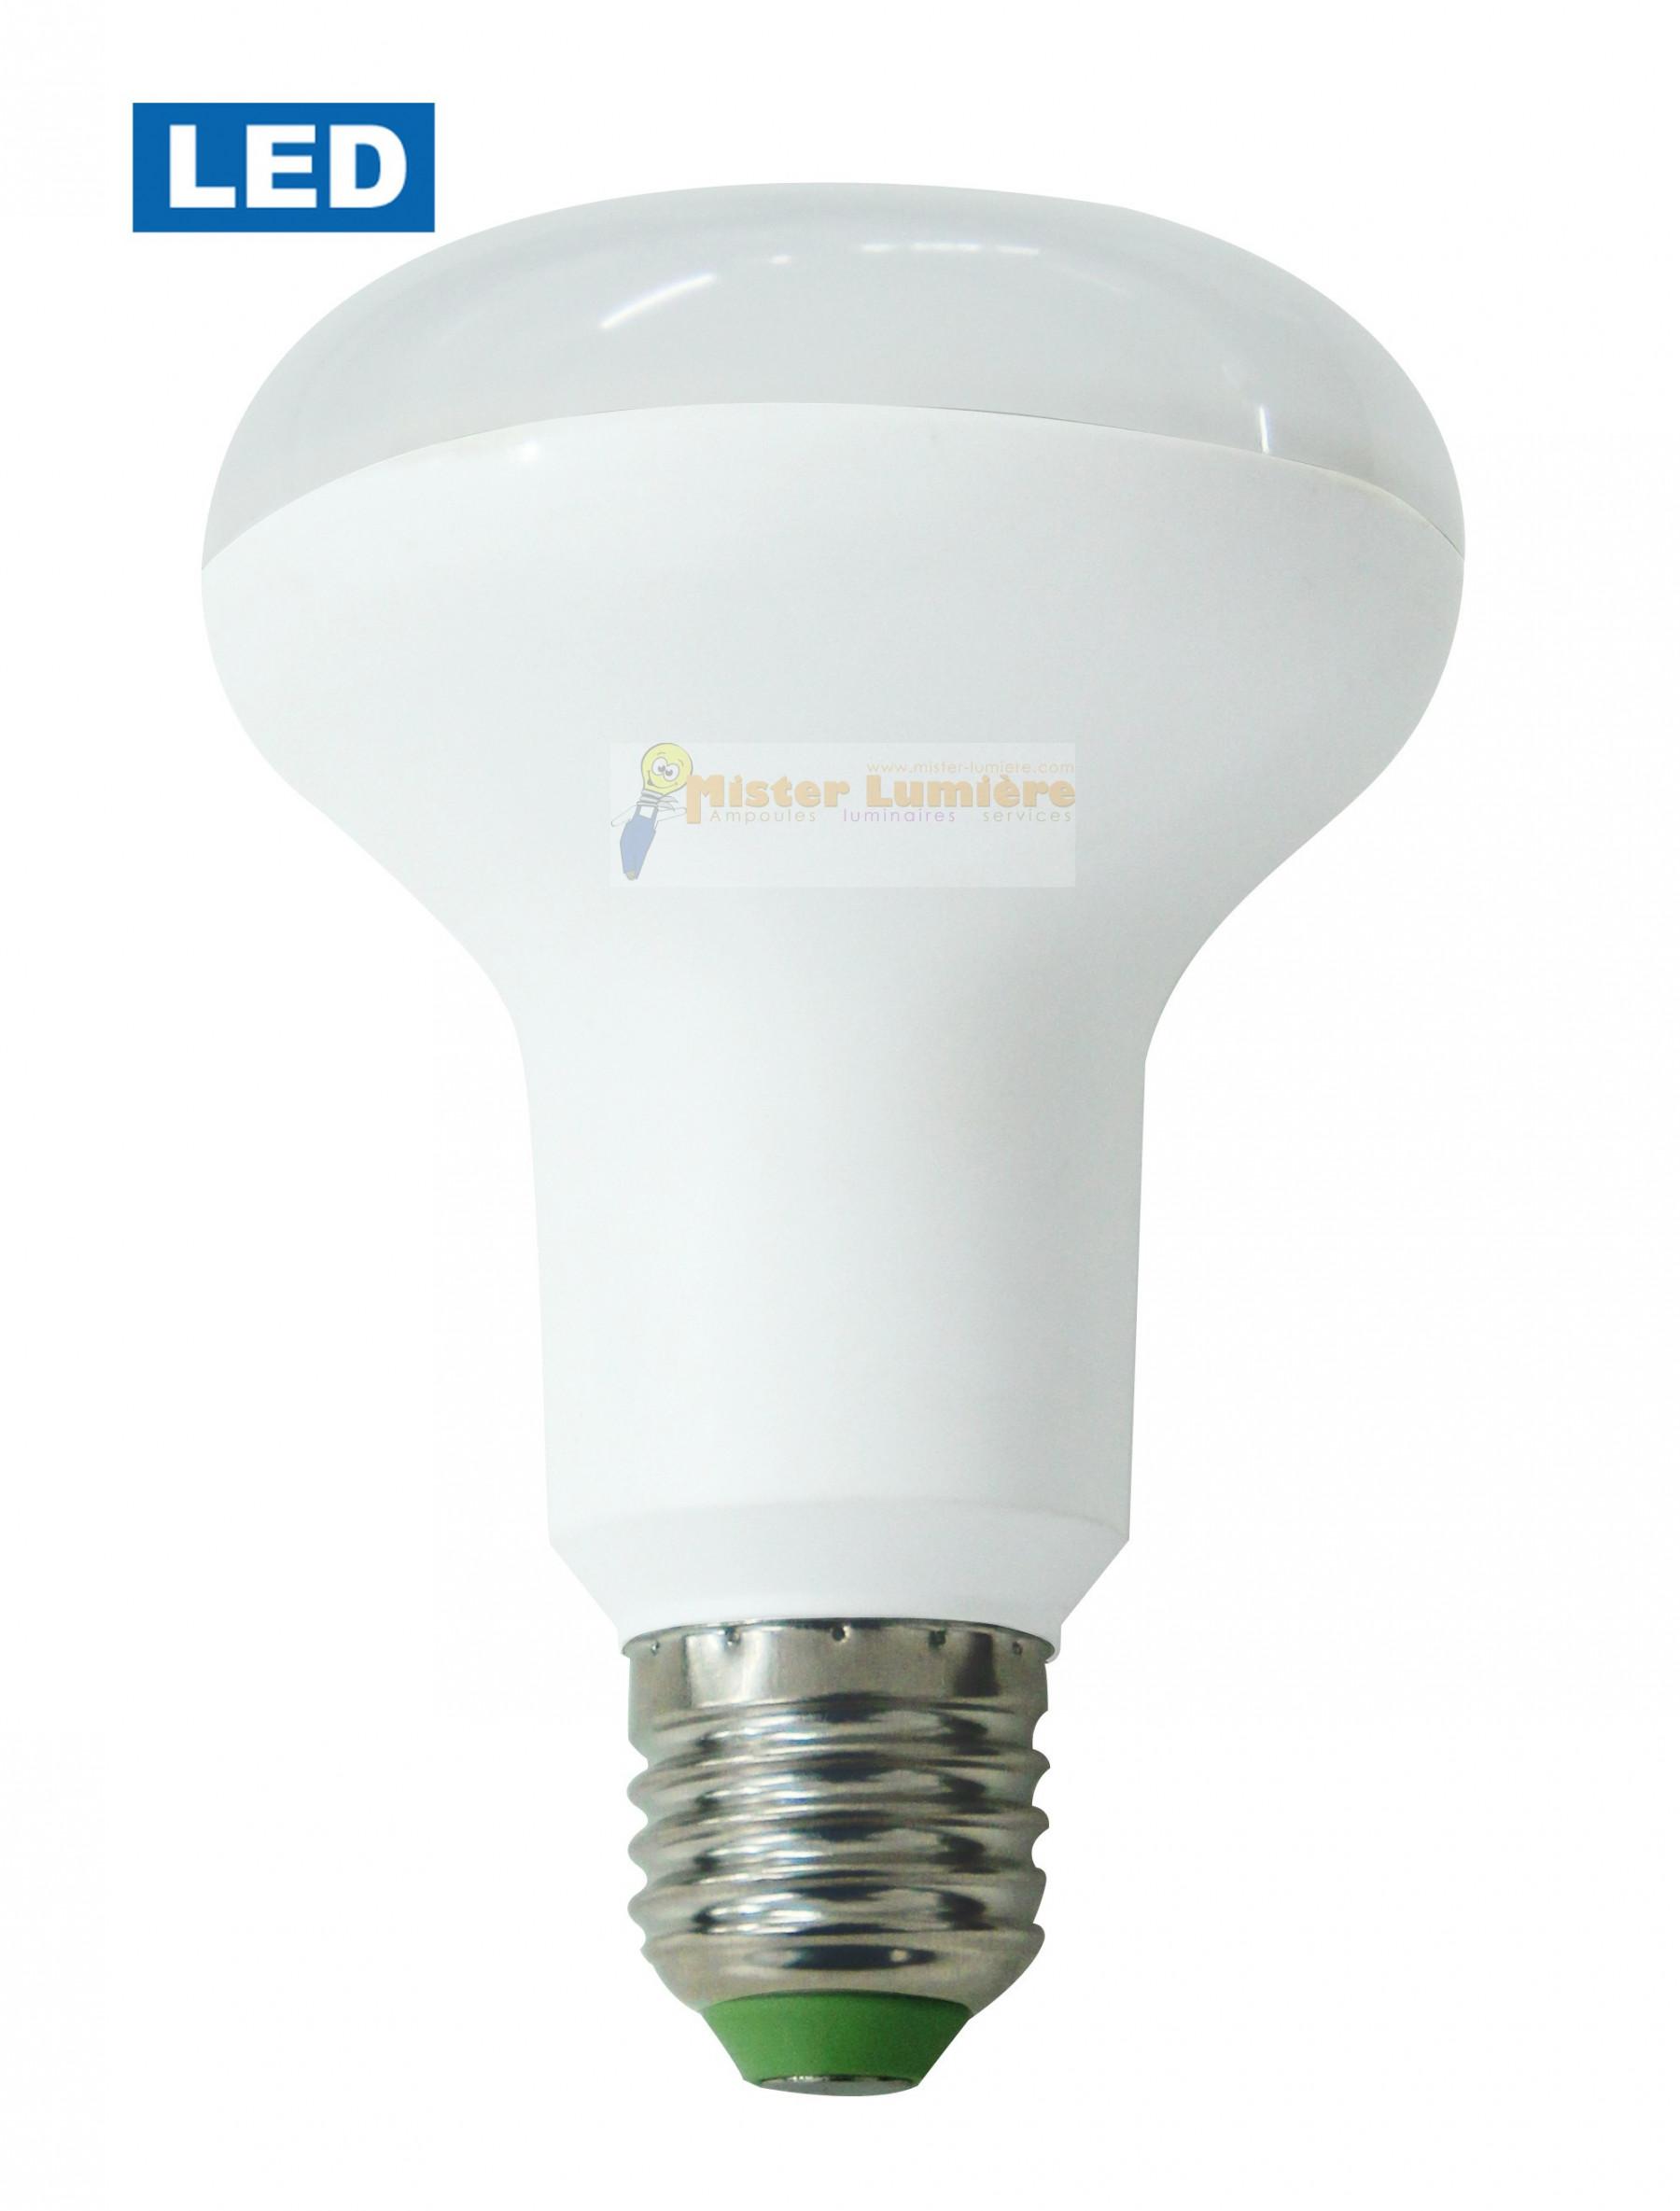 spot led r80 e27 12 watt blanc chaud quivalent 100 watt. Black Bedroom Furniture Sets. Home Design Ideas